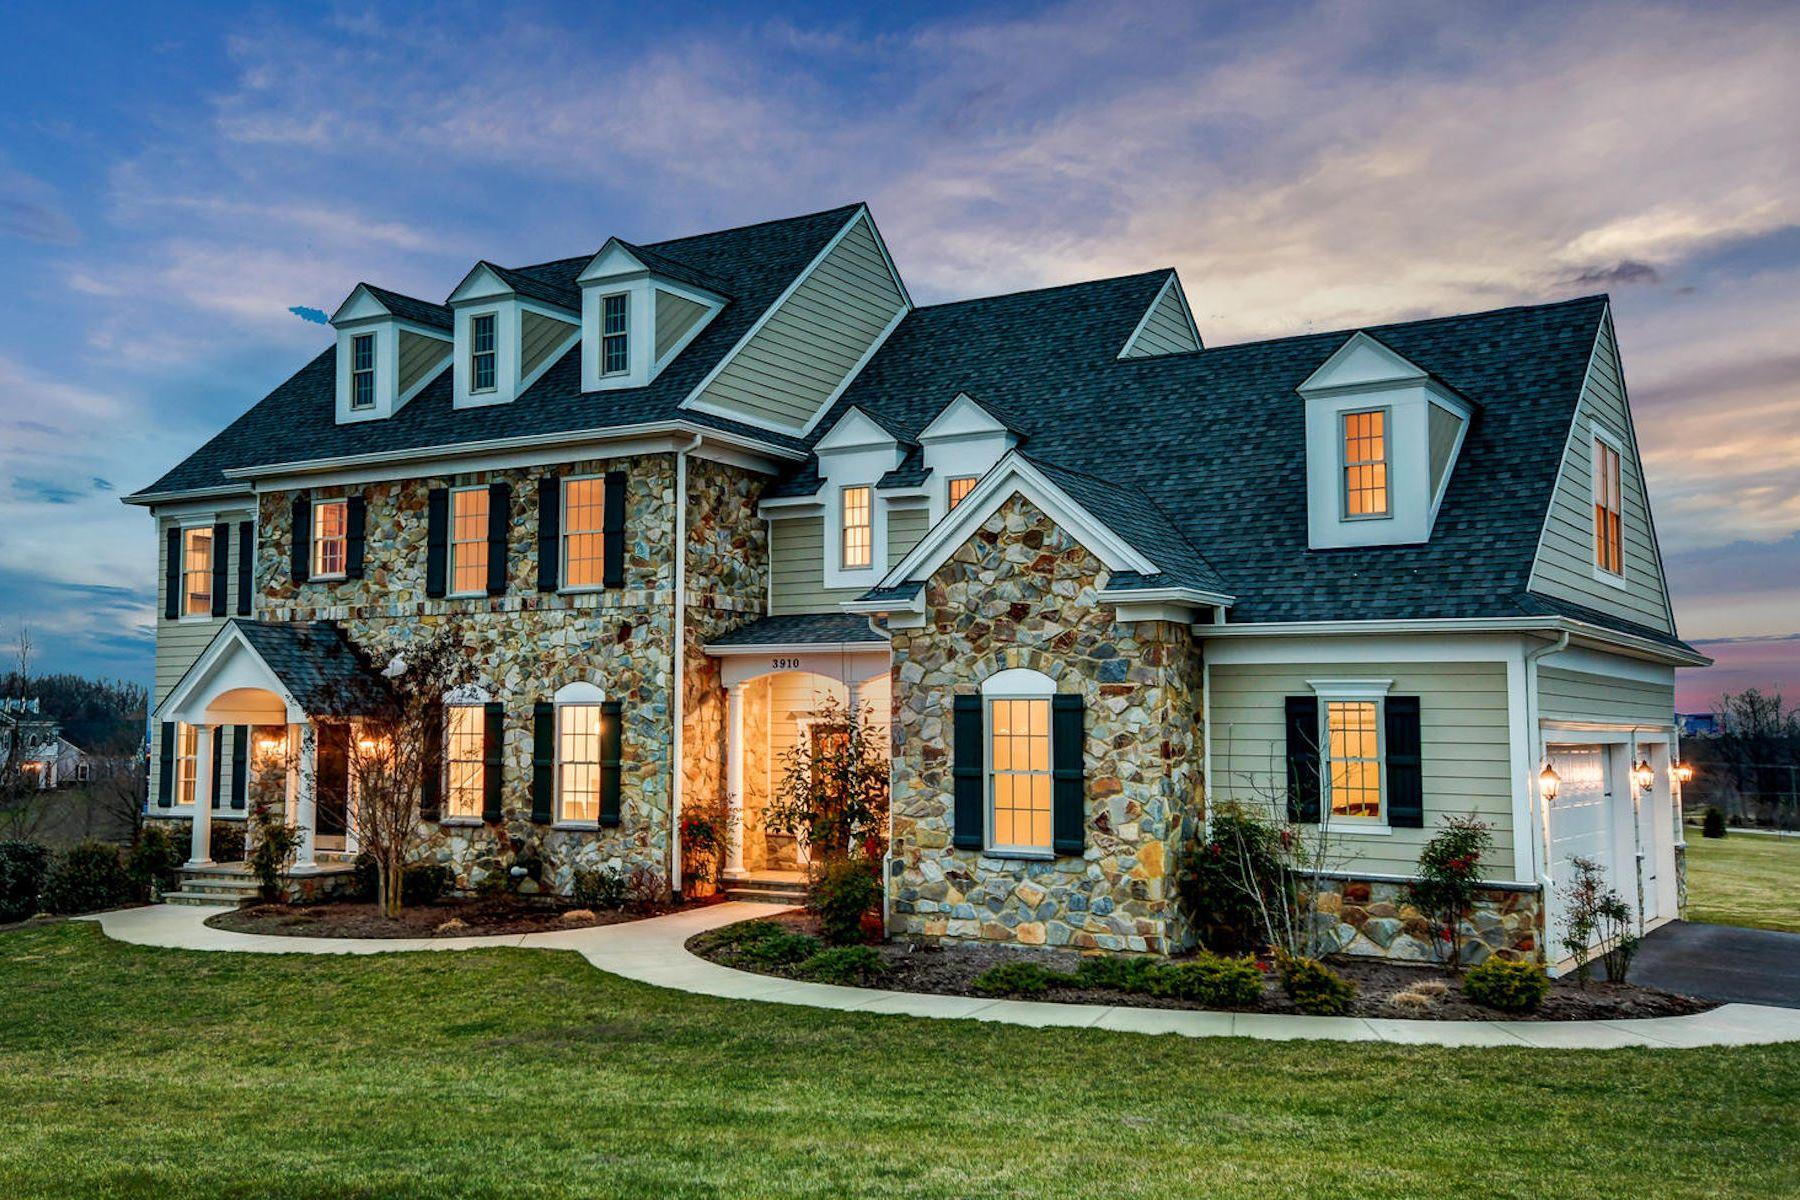 Single Family Homes for Active at Brian Knoll 3910 Briar Knoll Circle Phoenix, Maryland 21131 United States